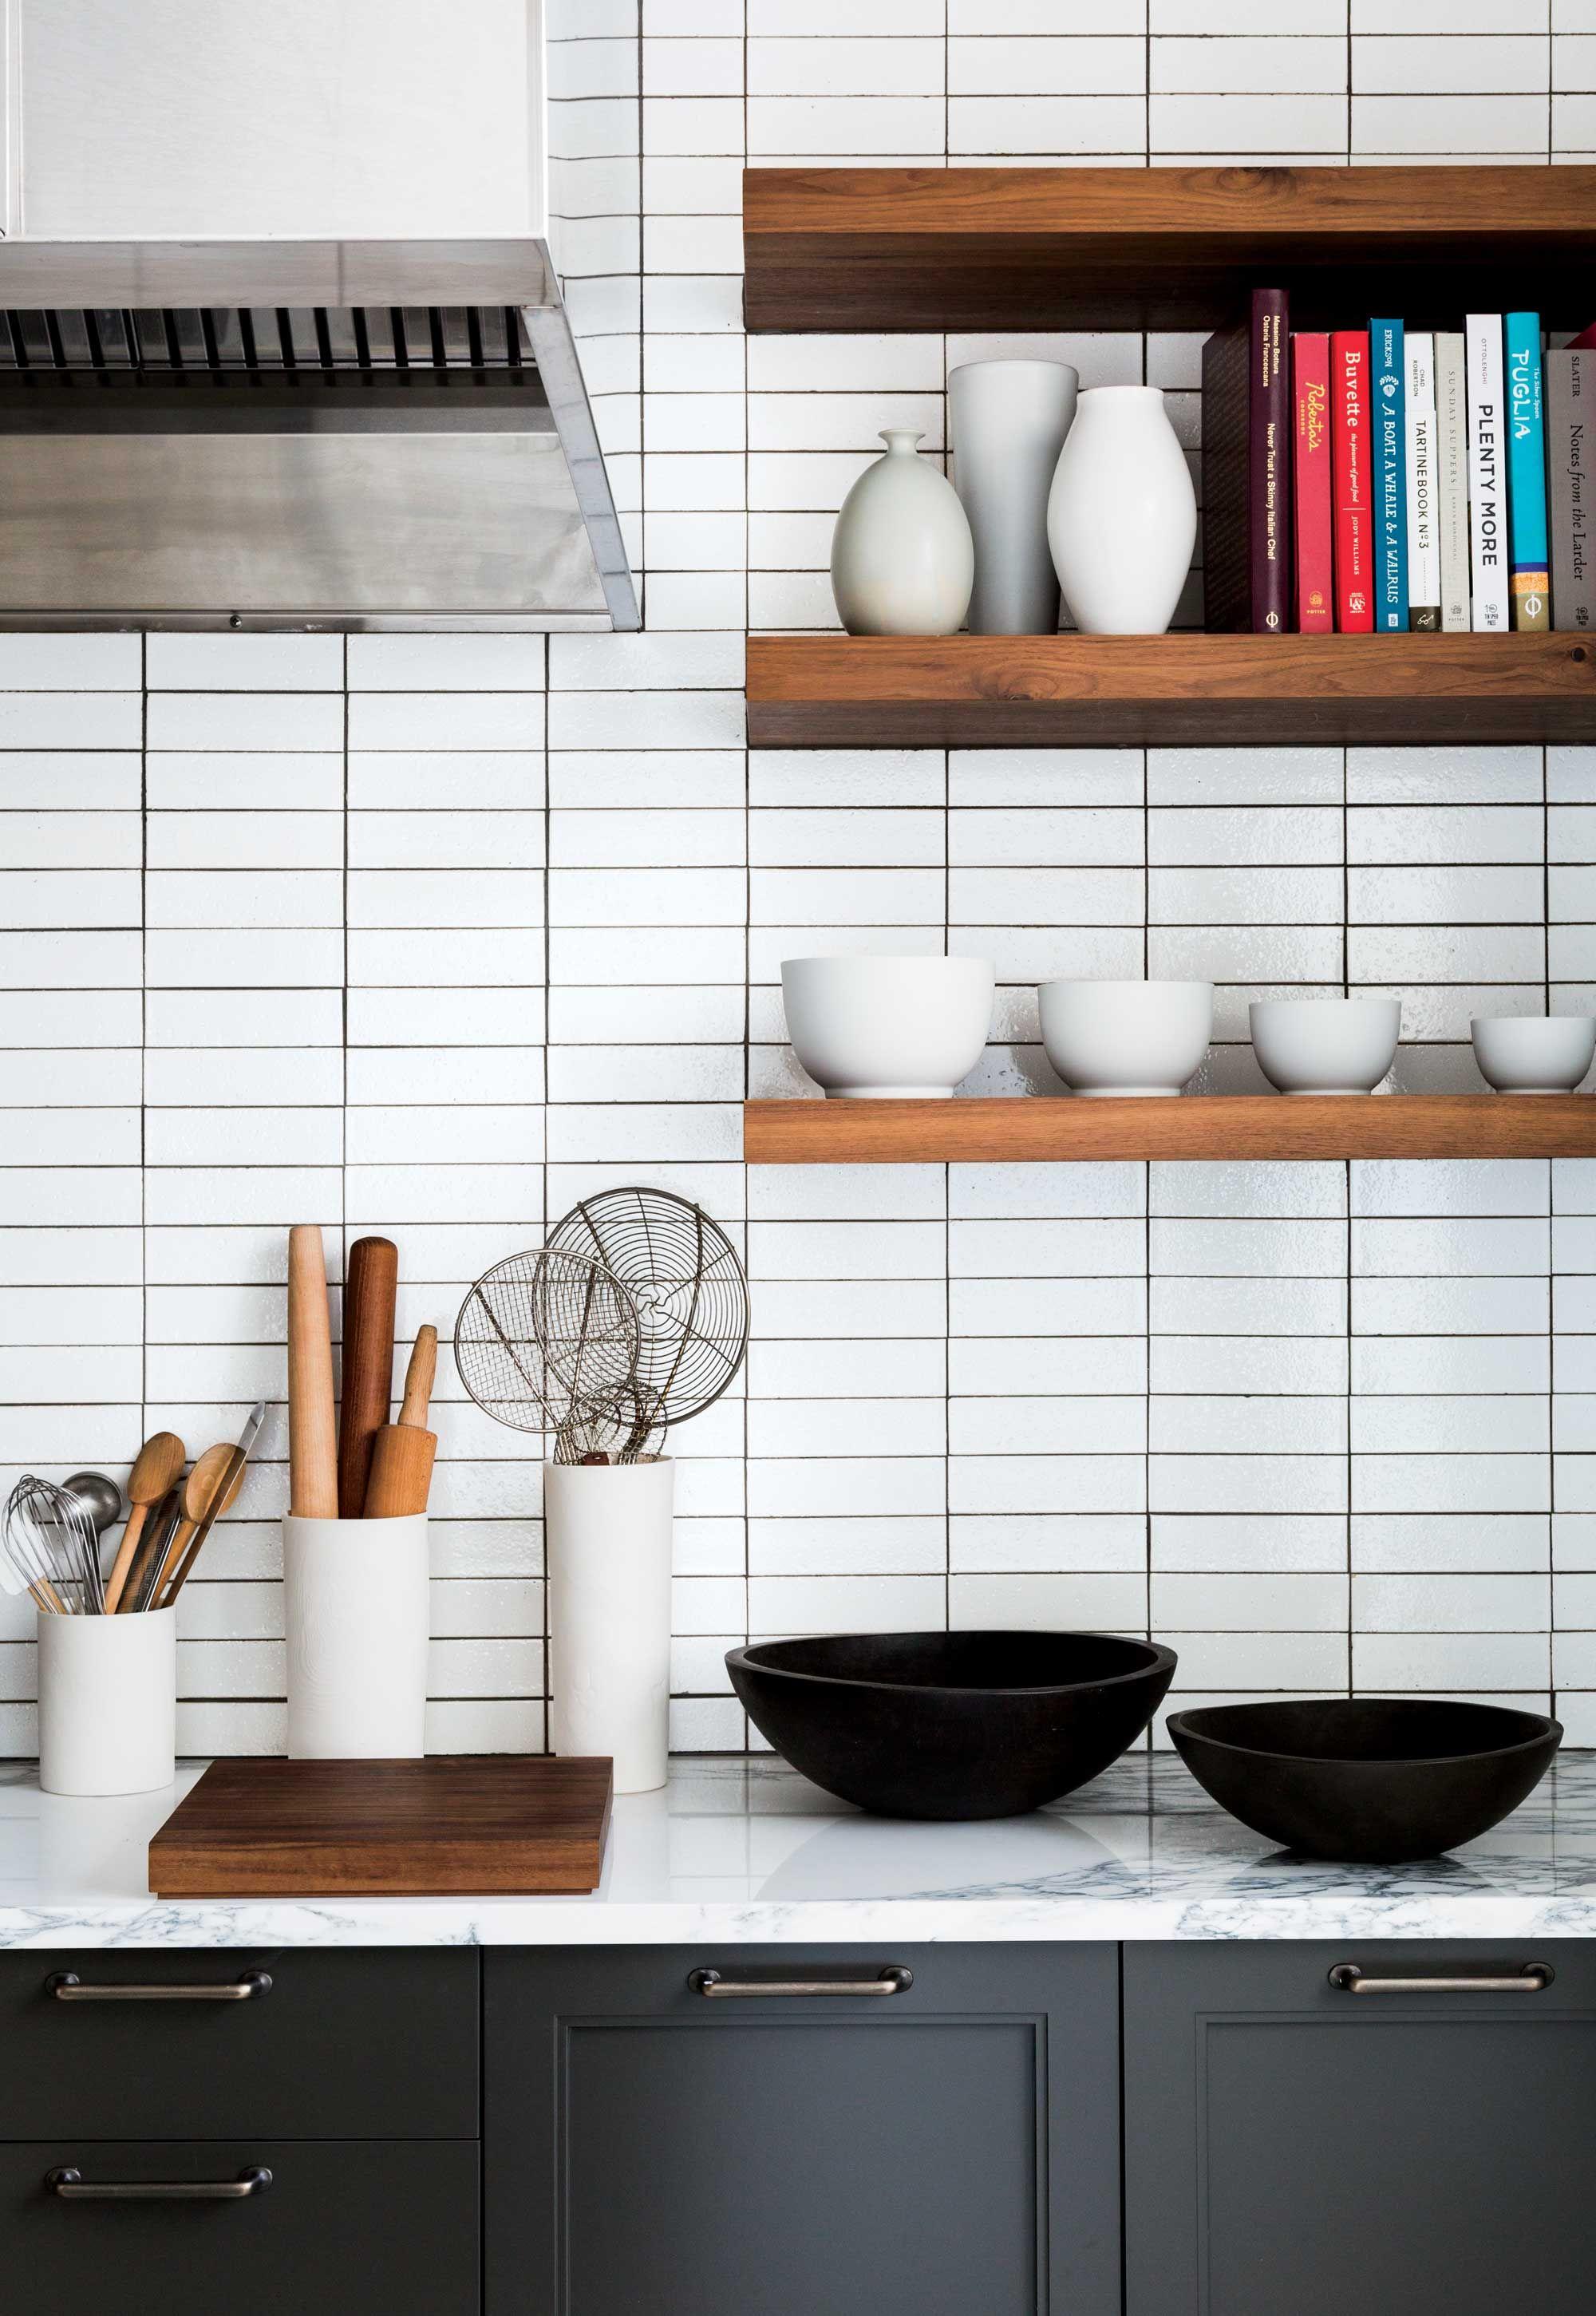 3 Kitchen Design Tips to Follow (and 3 Mistakes to Avoid) | Kitchen ...